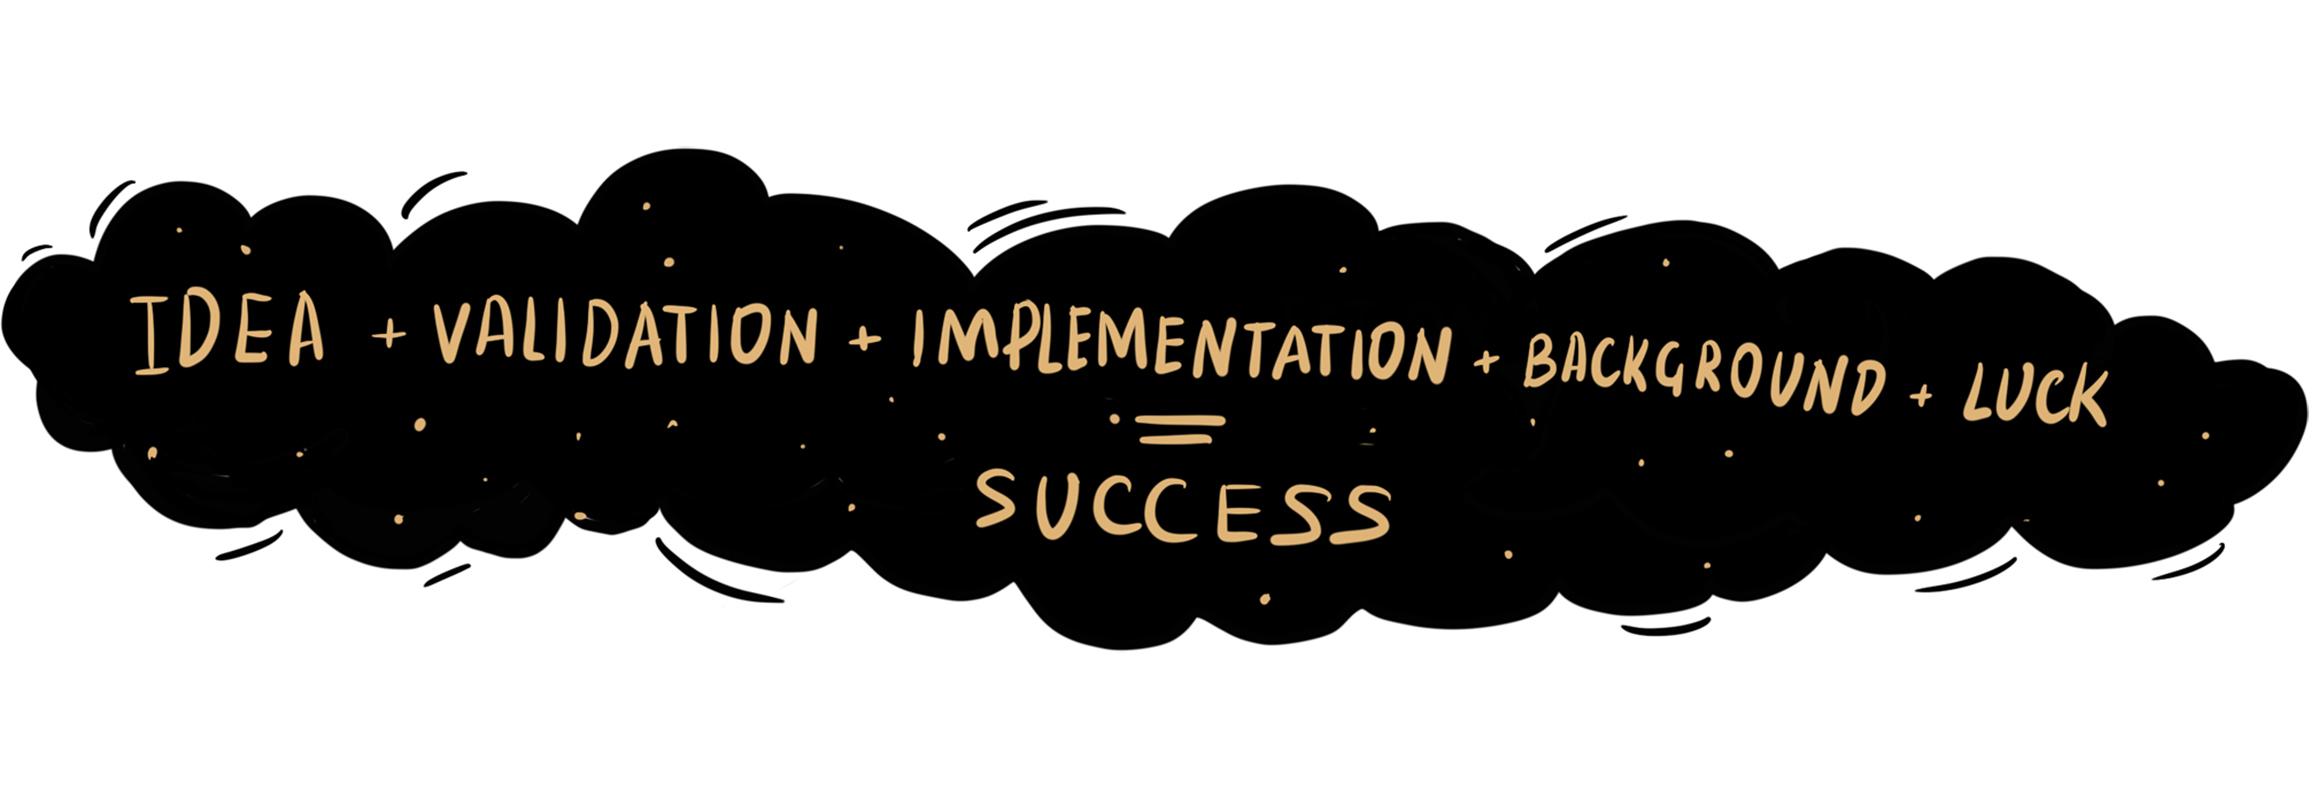 idea+validation+implementation+background+luck=success